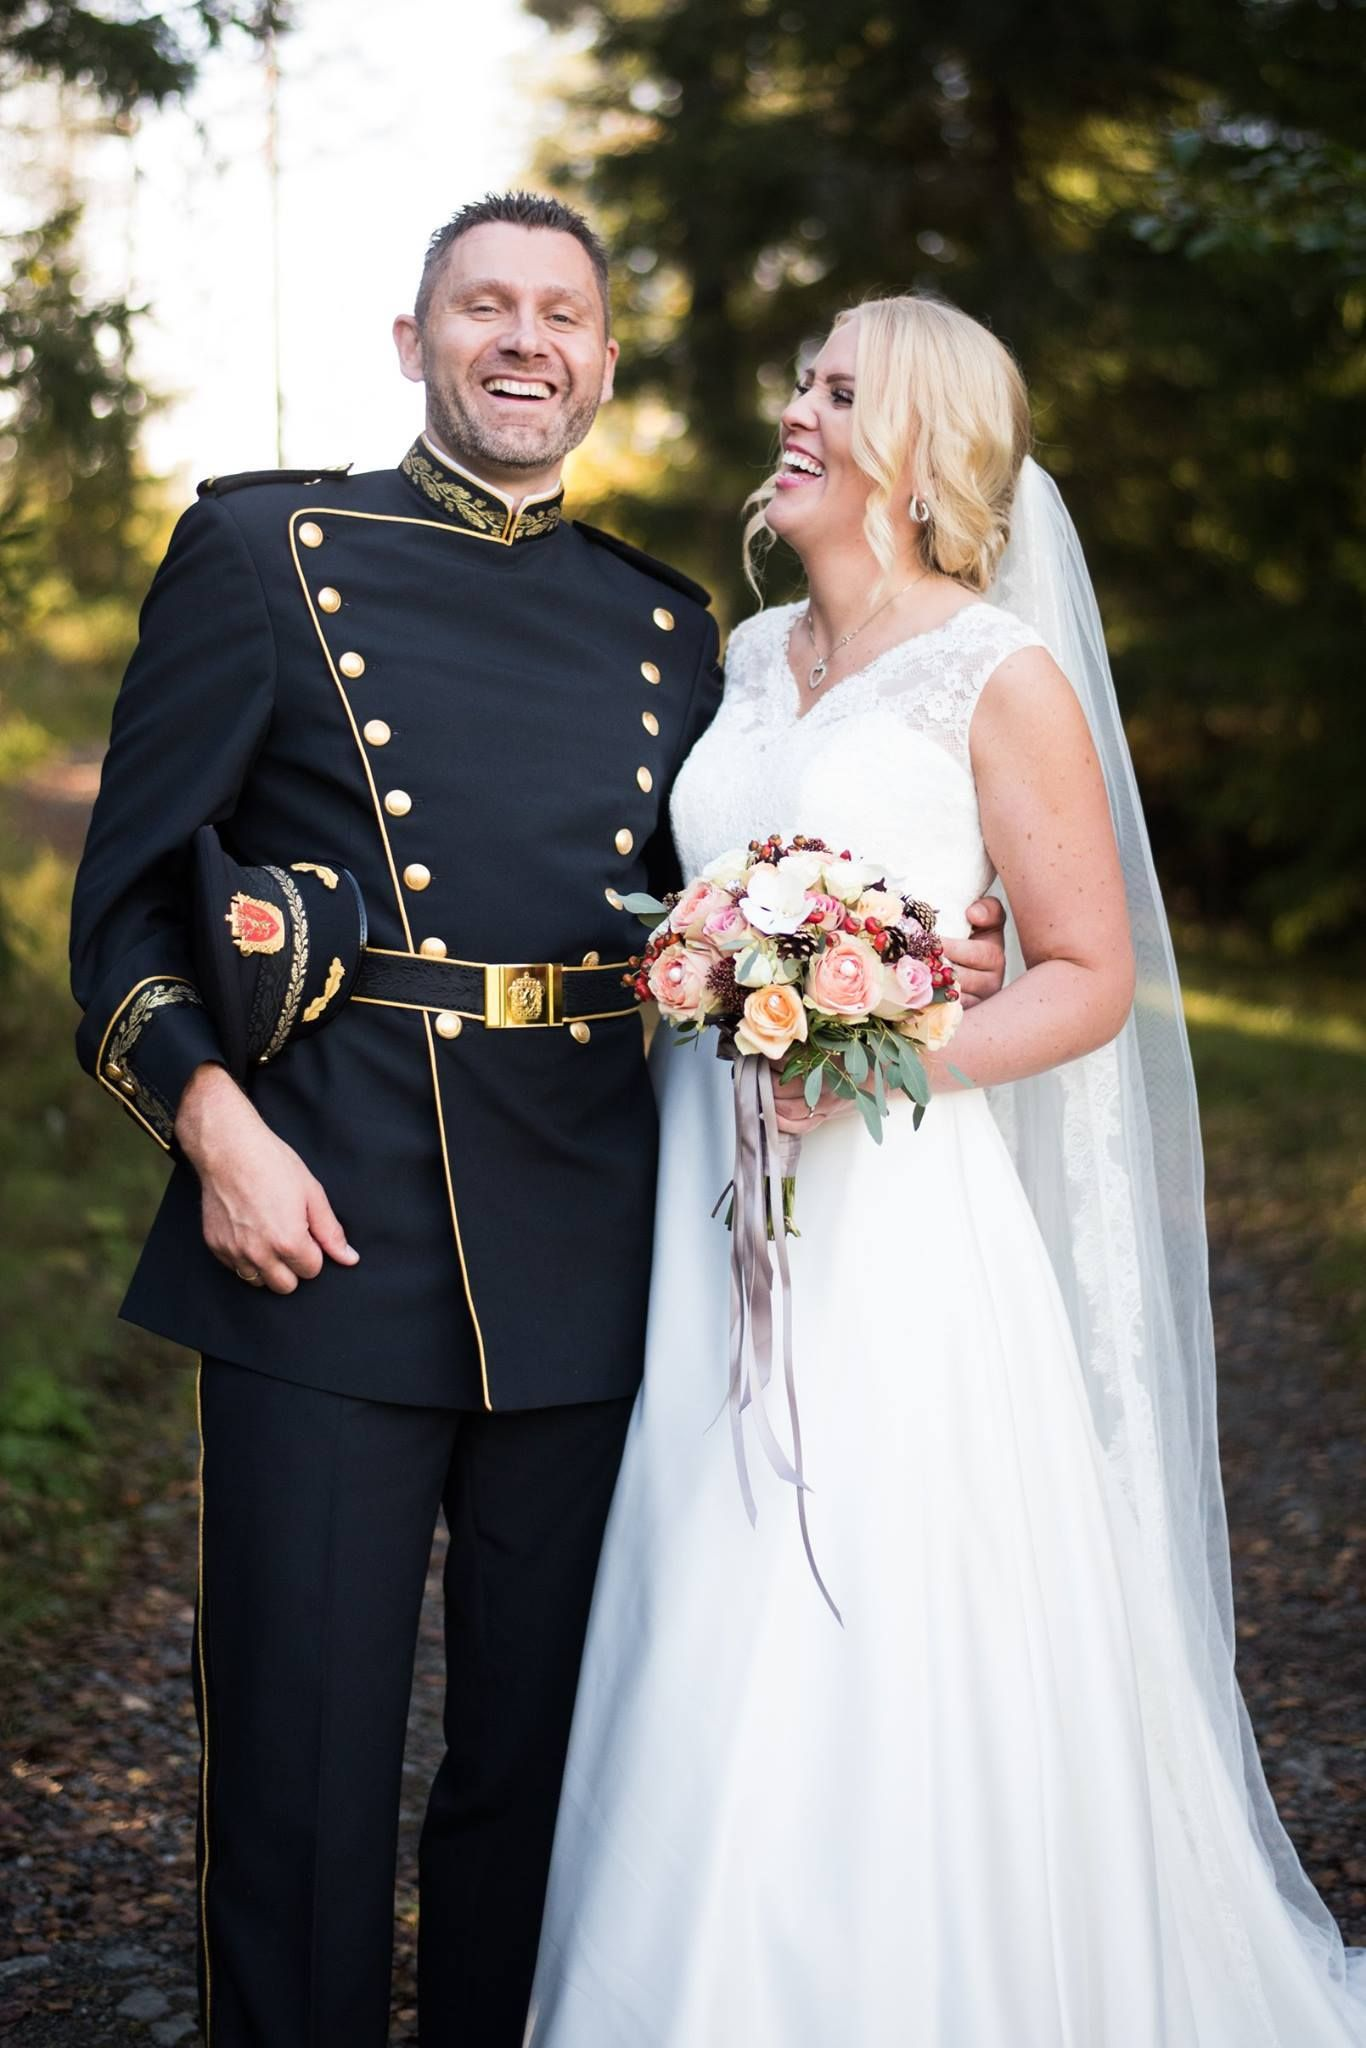 Bryllupsfotografering på Losby Gods #bryllupsfotograf #bryllupsfotografering #bryllup #losby #losbygods #norge